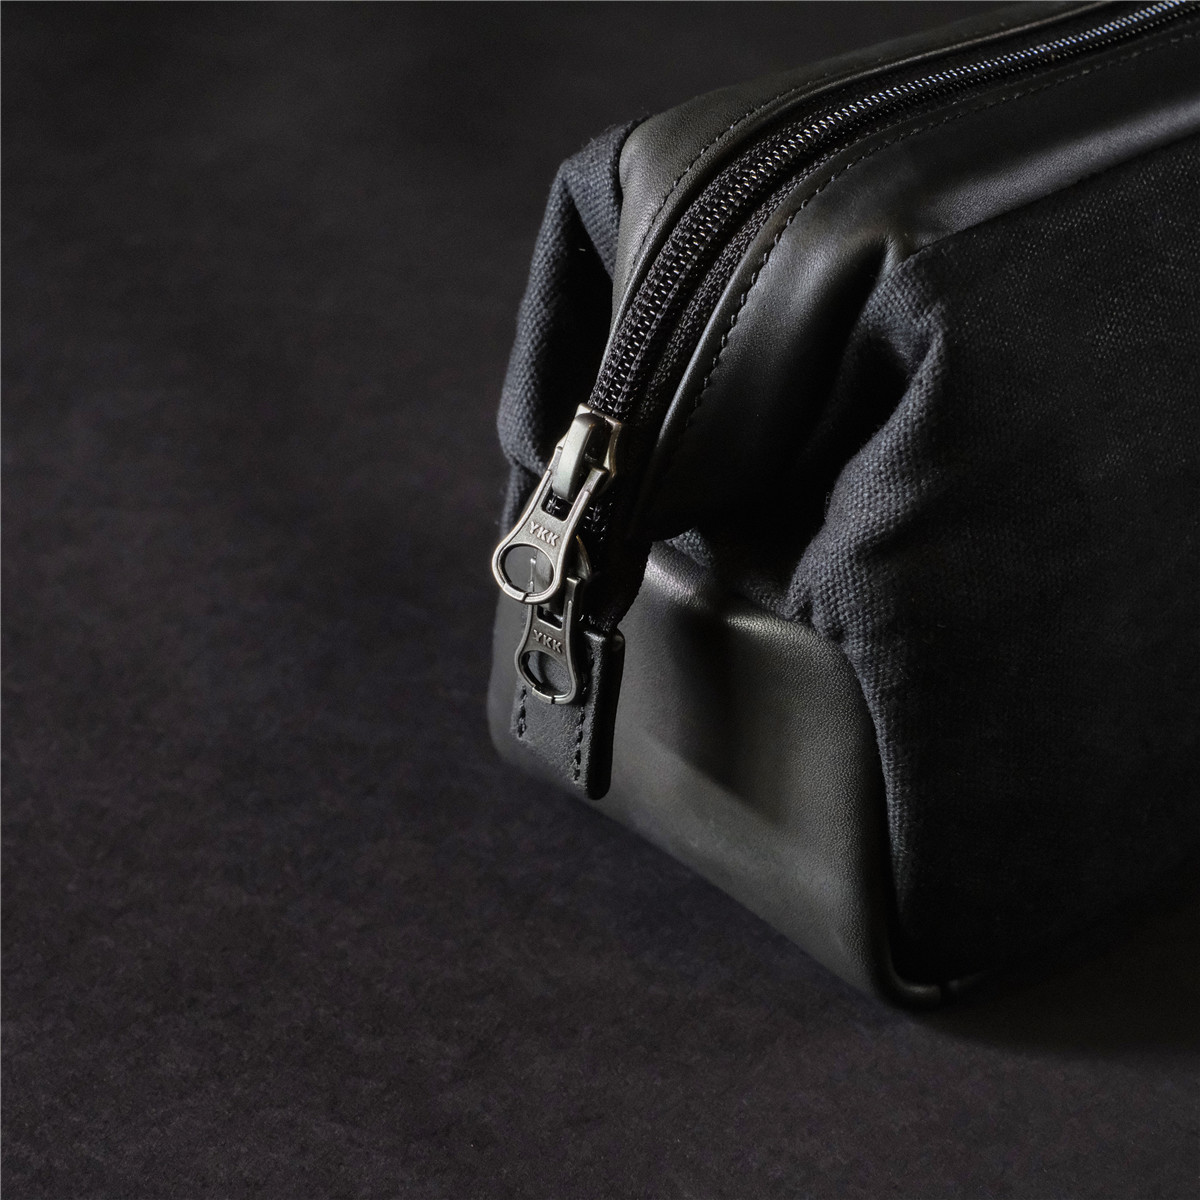 cam-in 真皮/防水蜂蜡布 专业摄影器材收纳包单肩摄影包LCCB-003